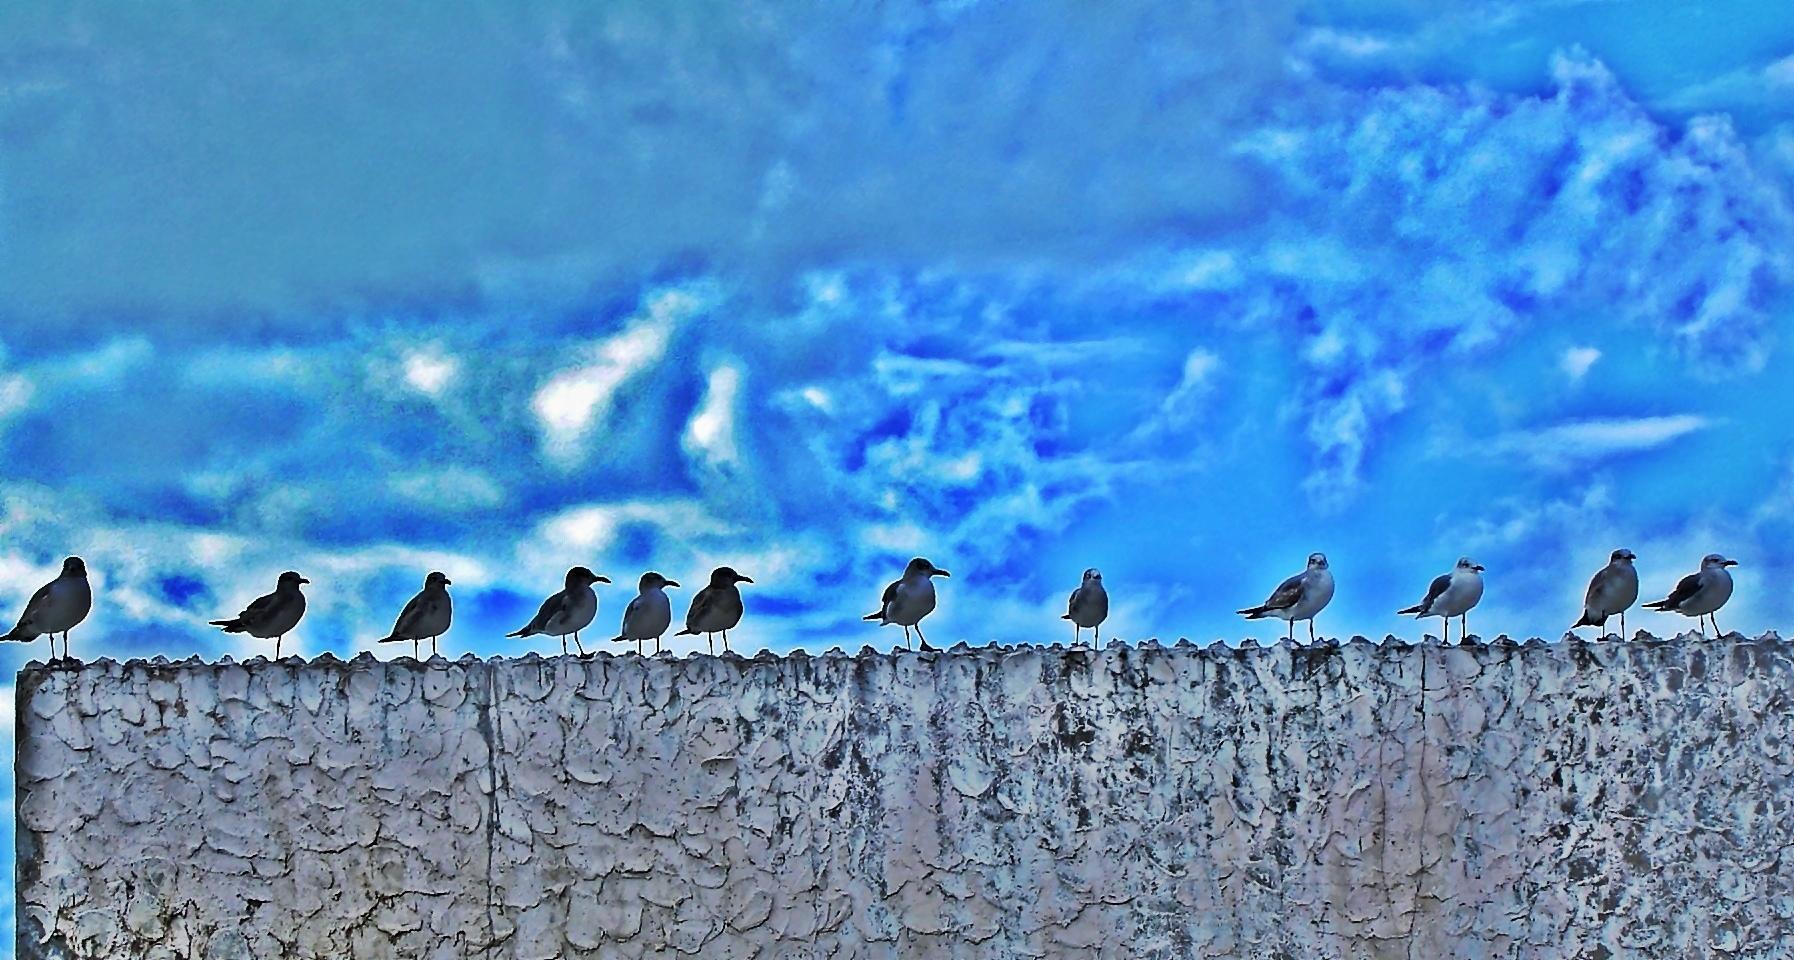 Waiting Seagulls